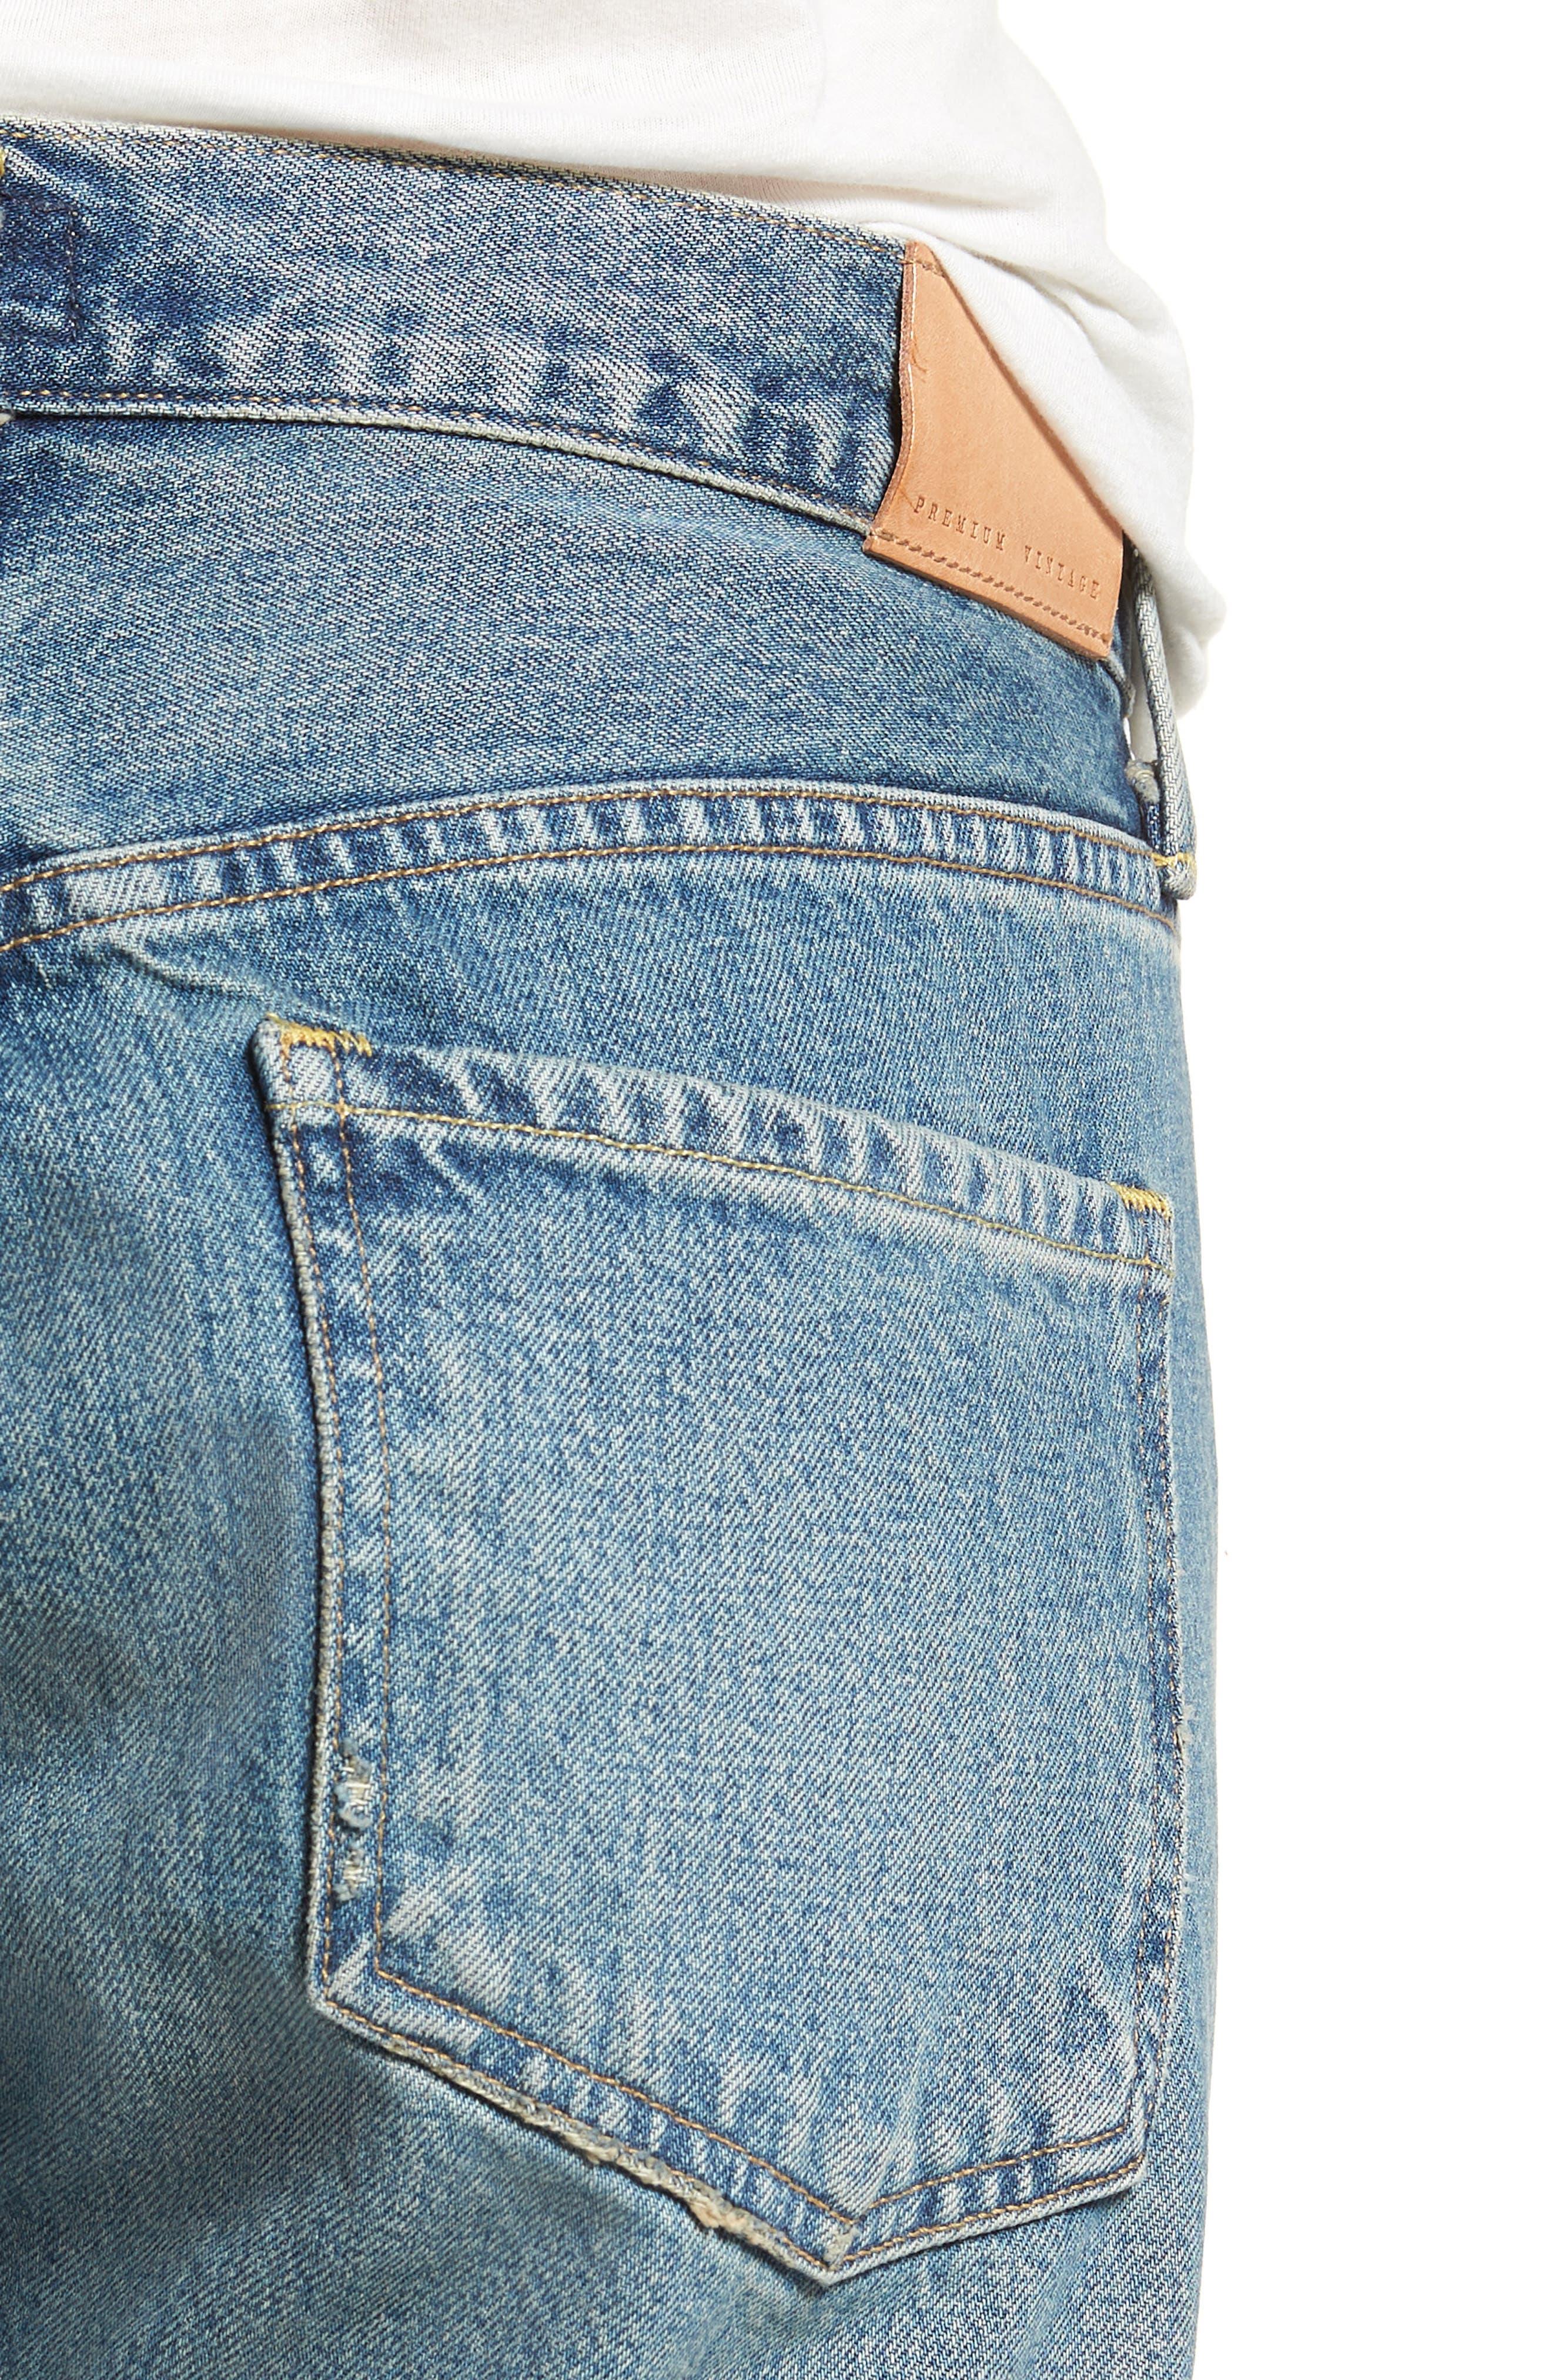 Emerson Crop Slim Boyfriend Jeans,                             Alternate thumbnail 4, color,                             Somerset